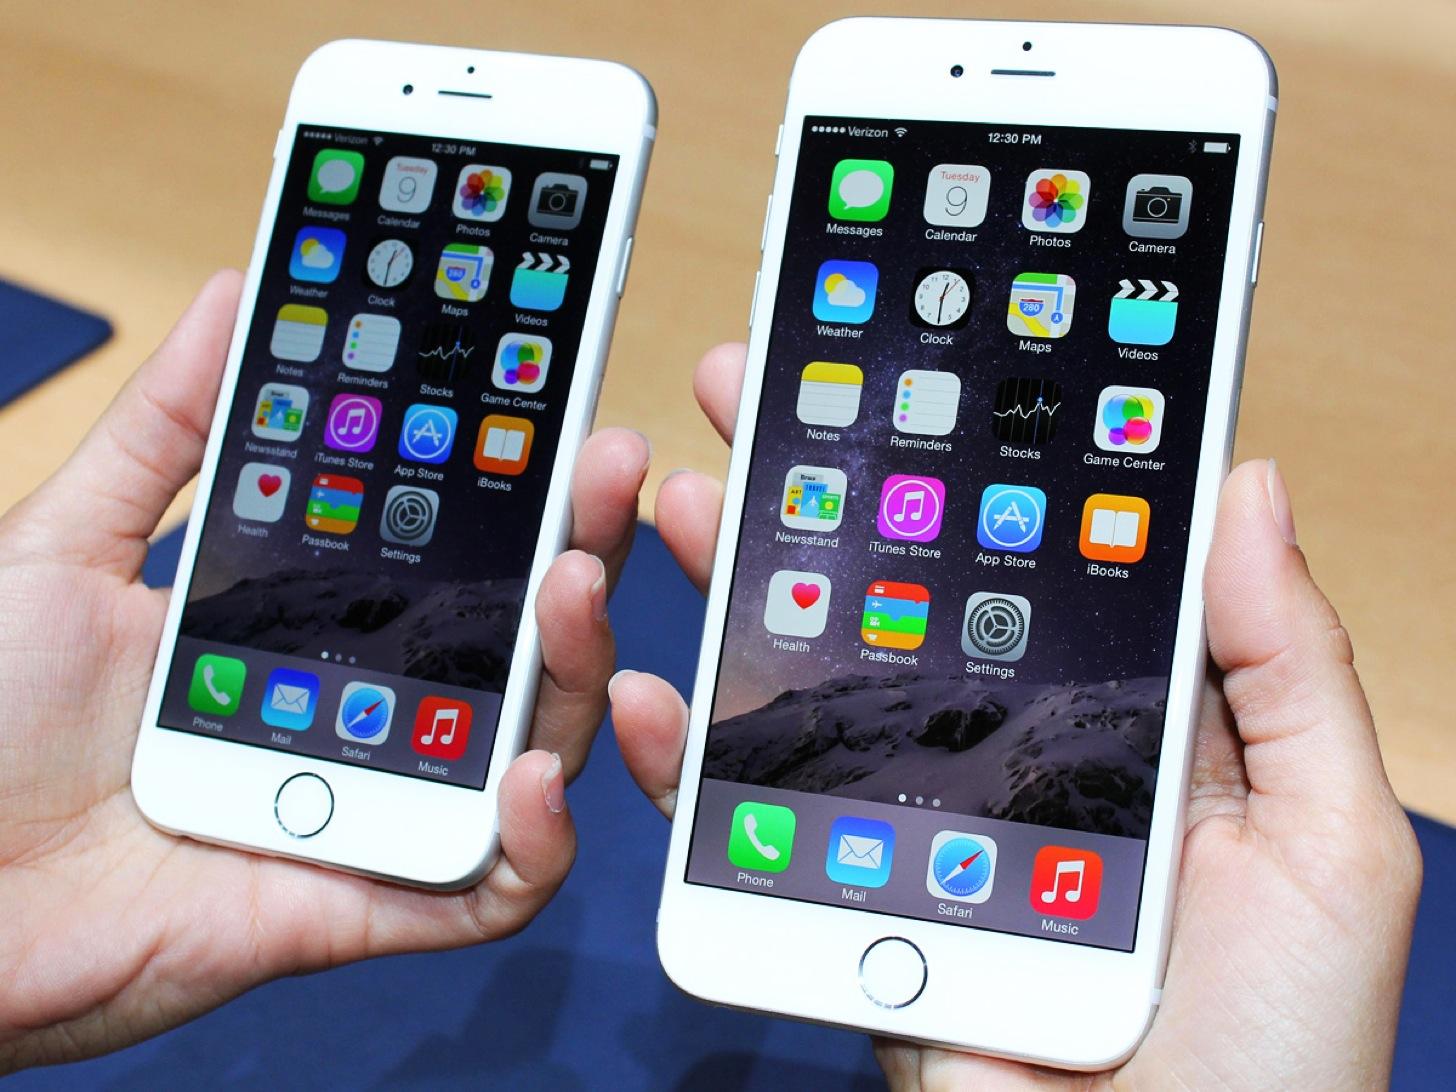 【iPhone 6 /iPhone 6 Plus】ドコモ / au / ソフトバンク / Apple Store でウェブ予約する際に便利な比較表!